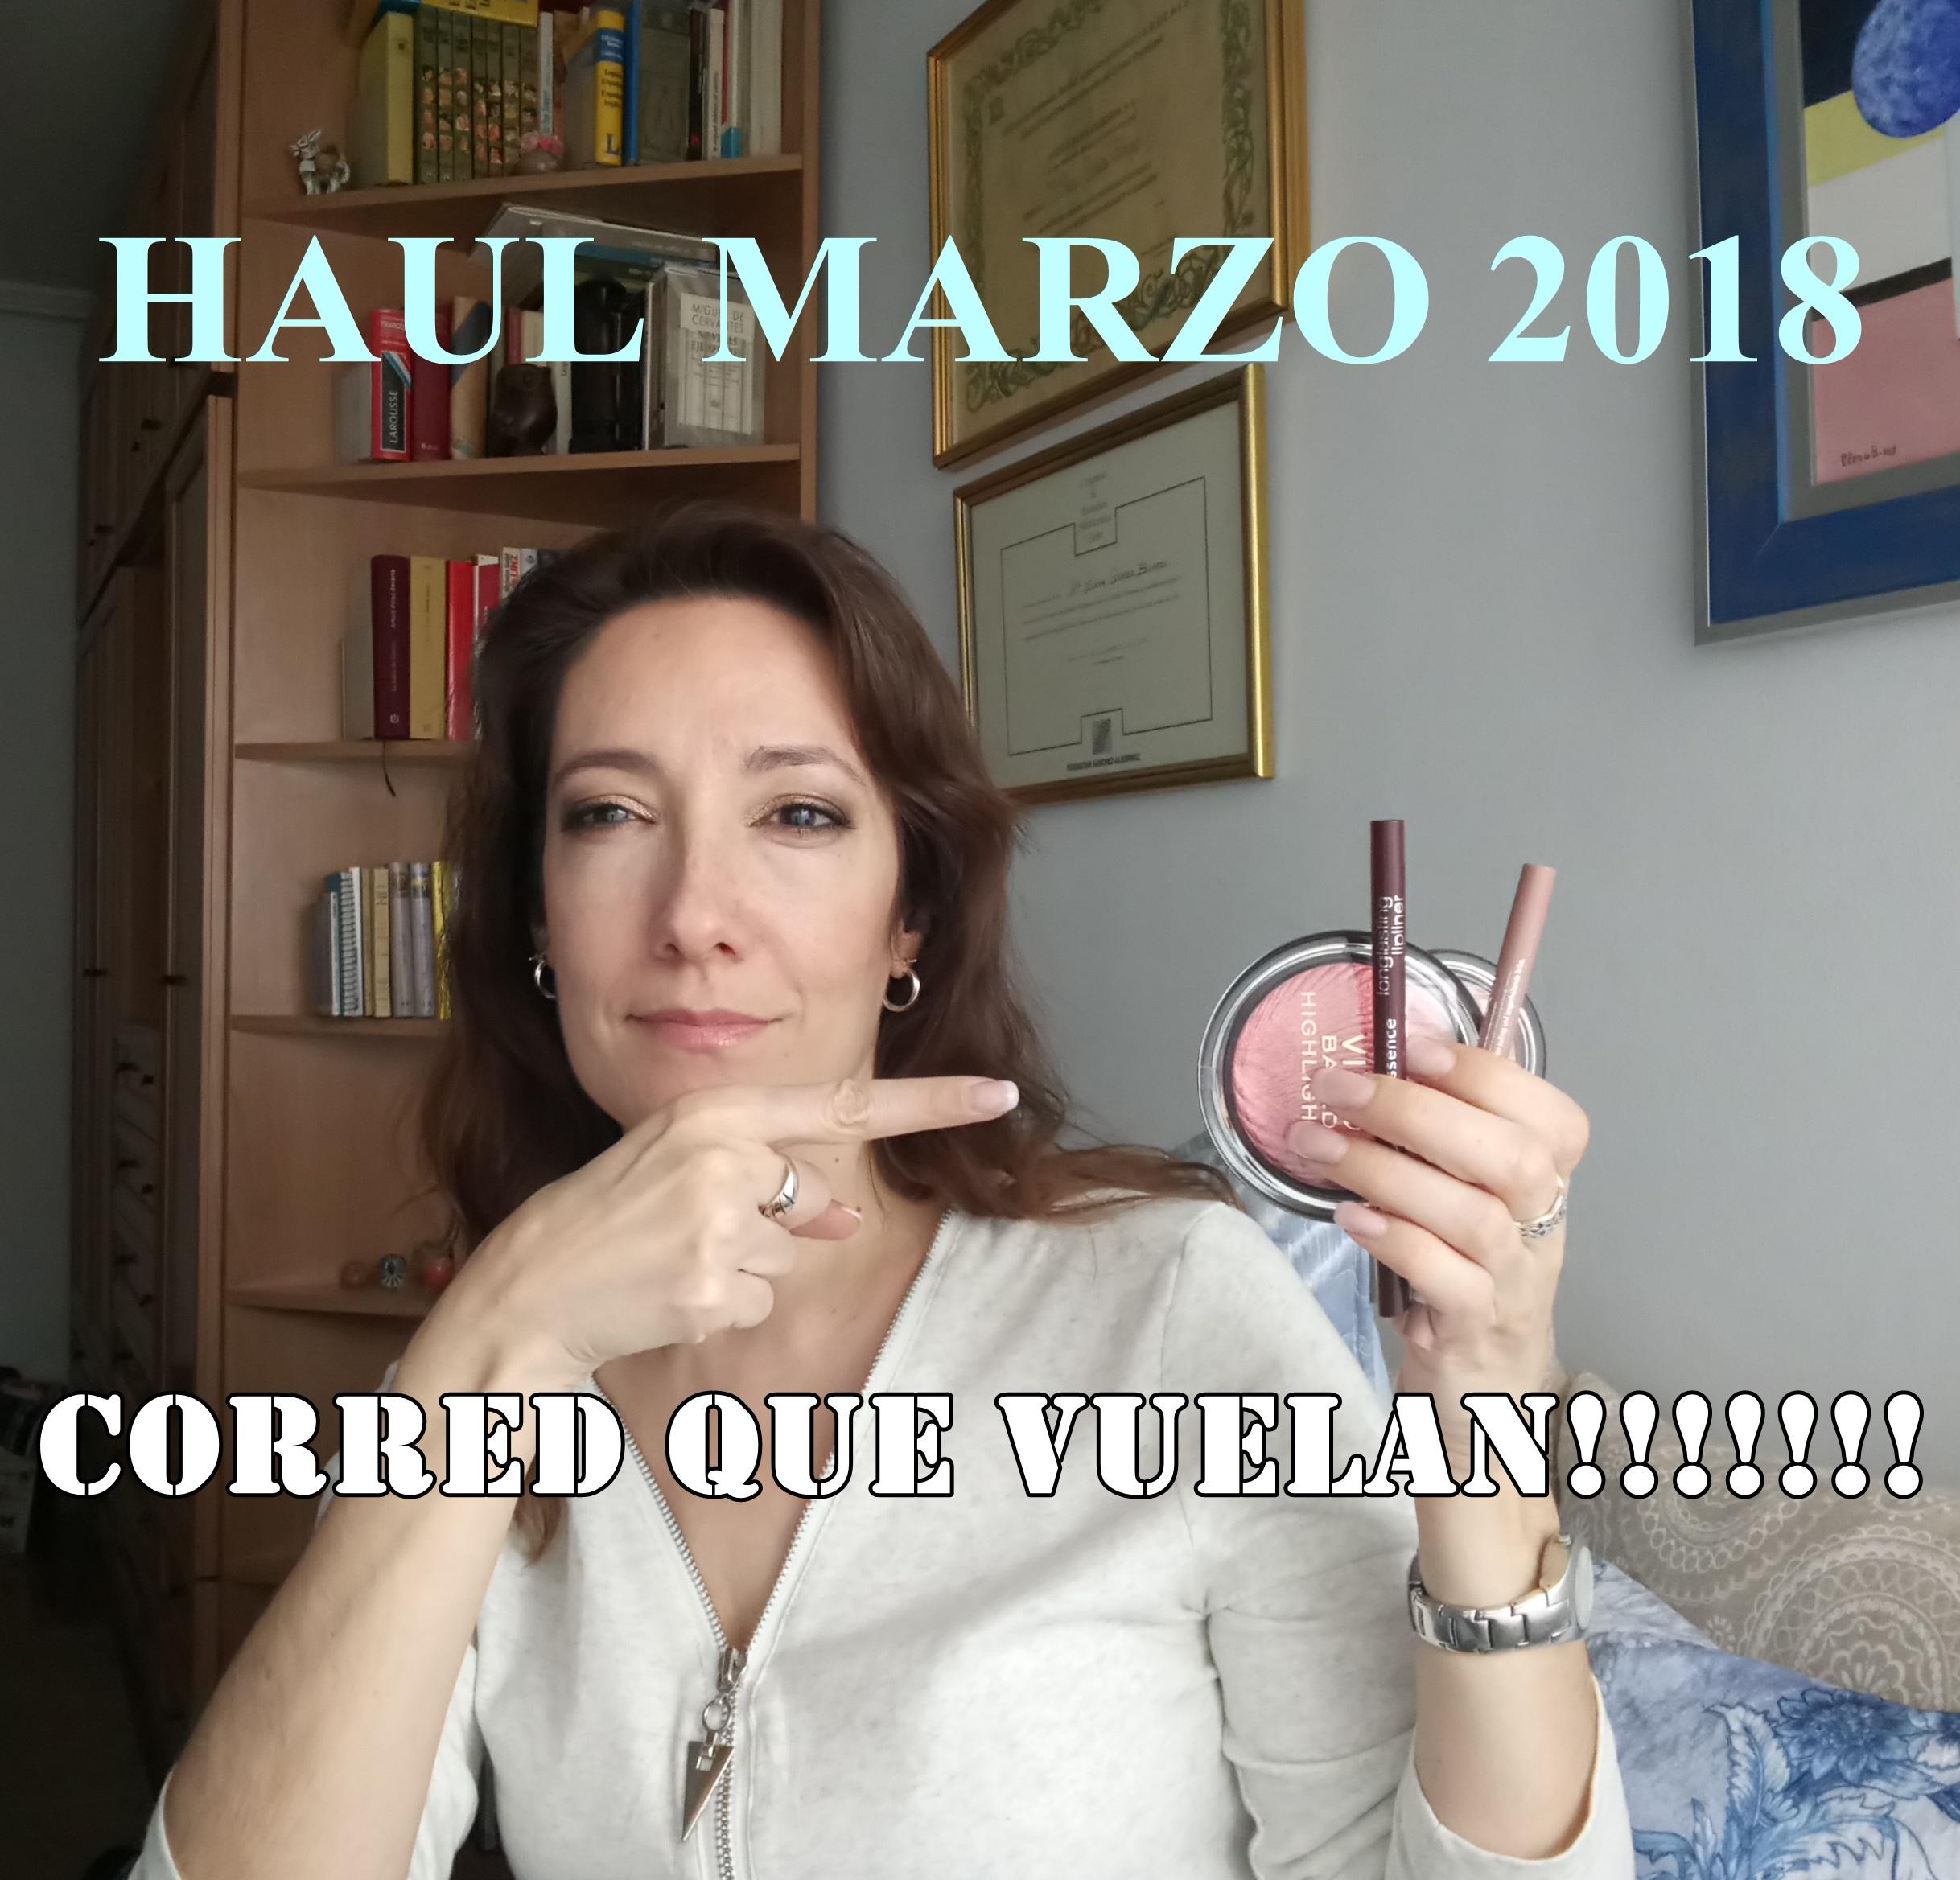 HAUL MARZO 2018